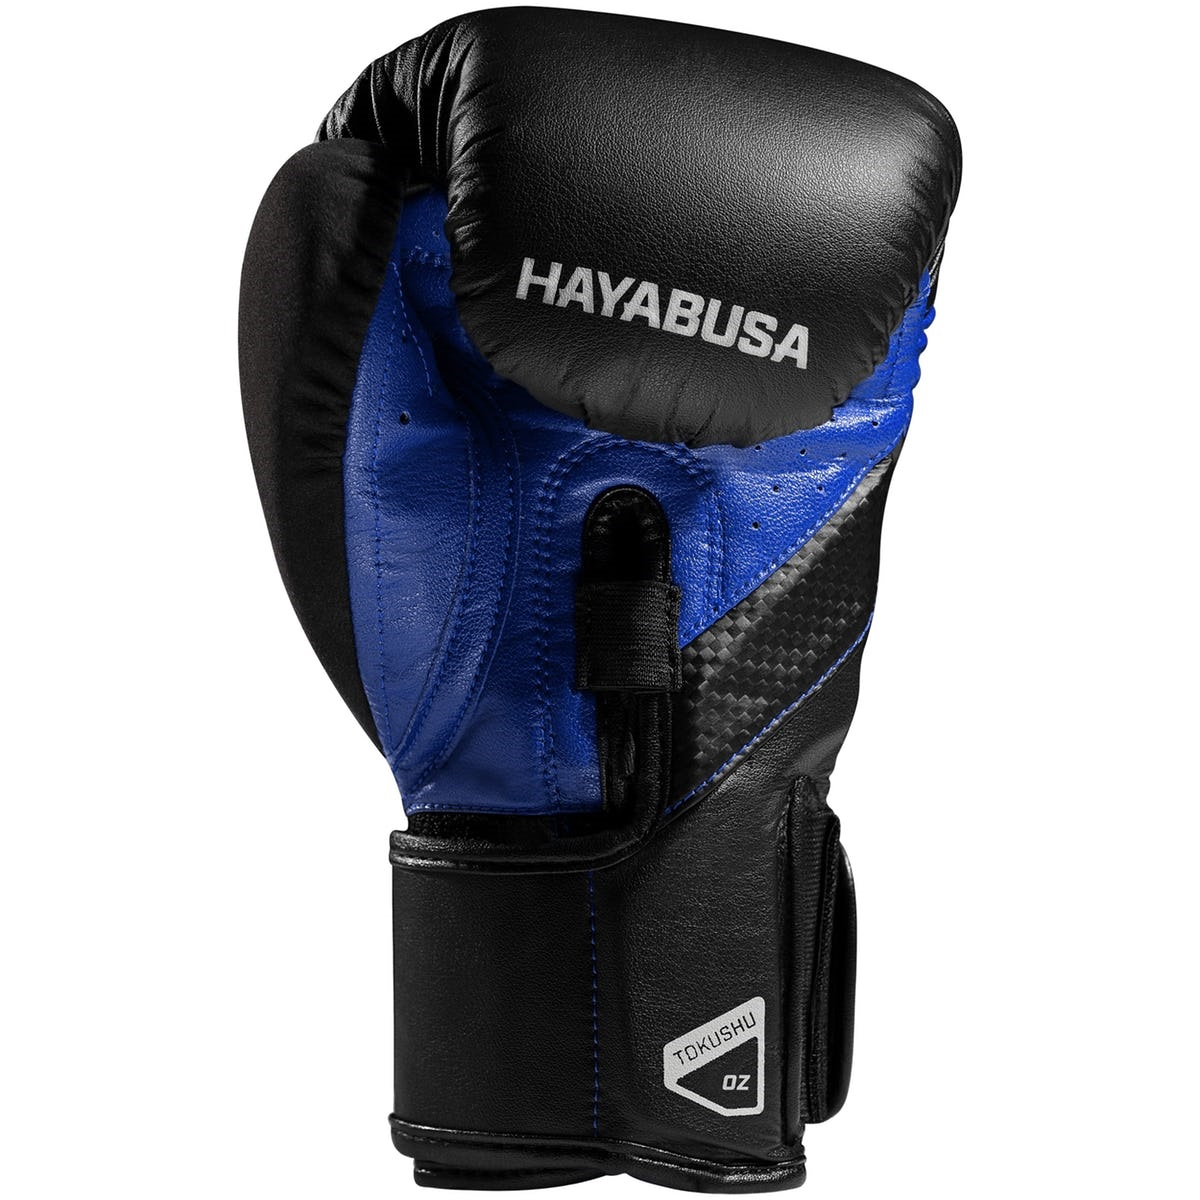 Hayabusa-T3-Dual-X-Hook-and-Loop-Closure-Vylar-Leather-Training-Boxing-Gloves thumbnail 6